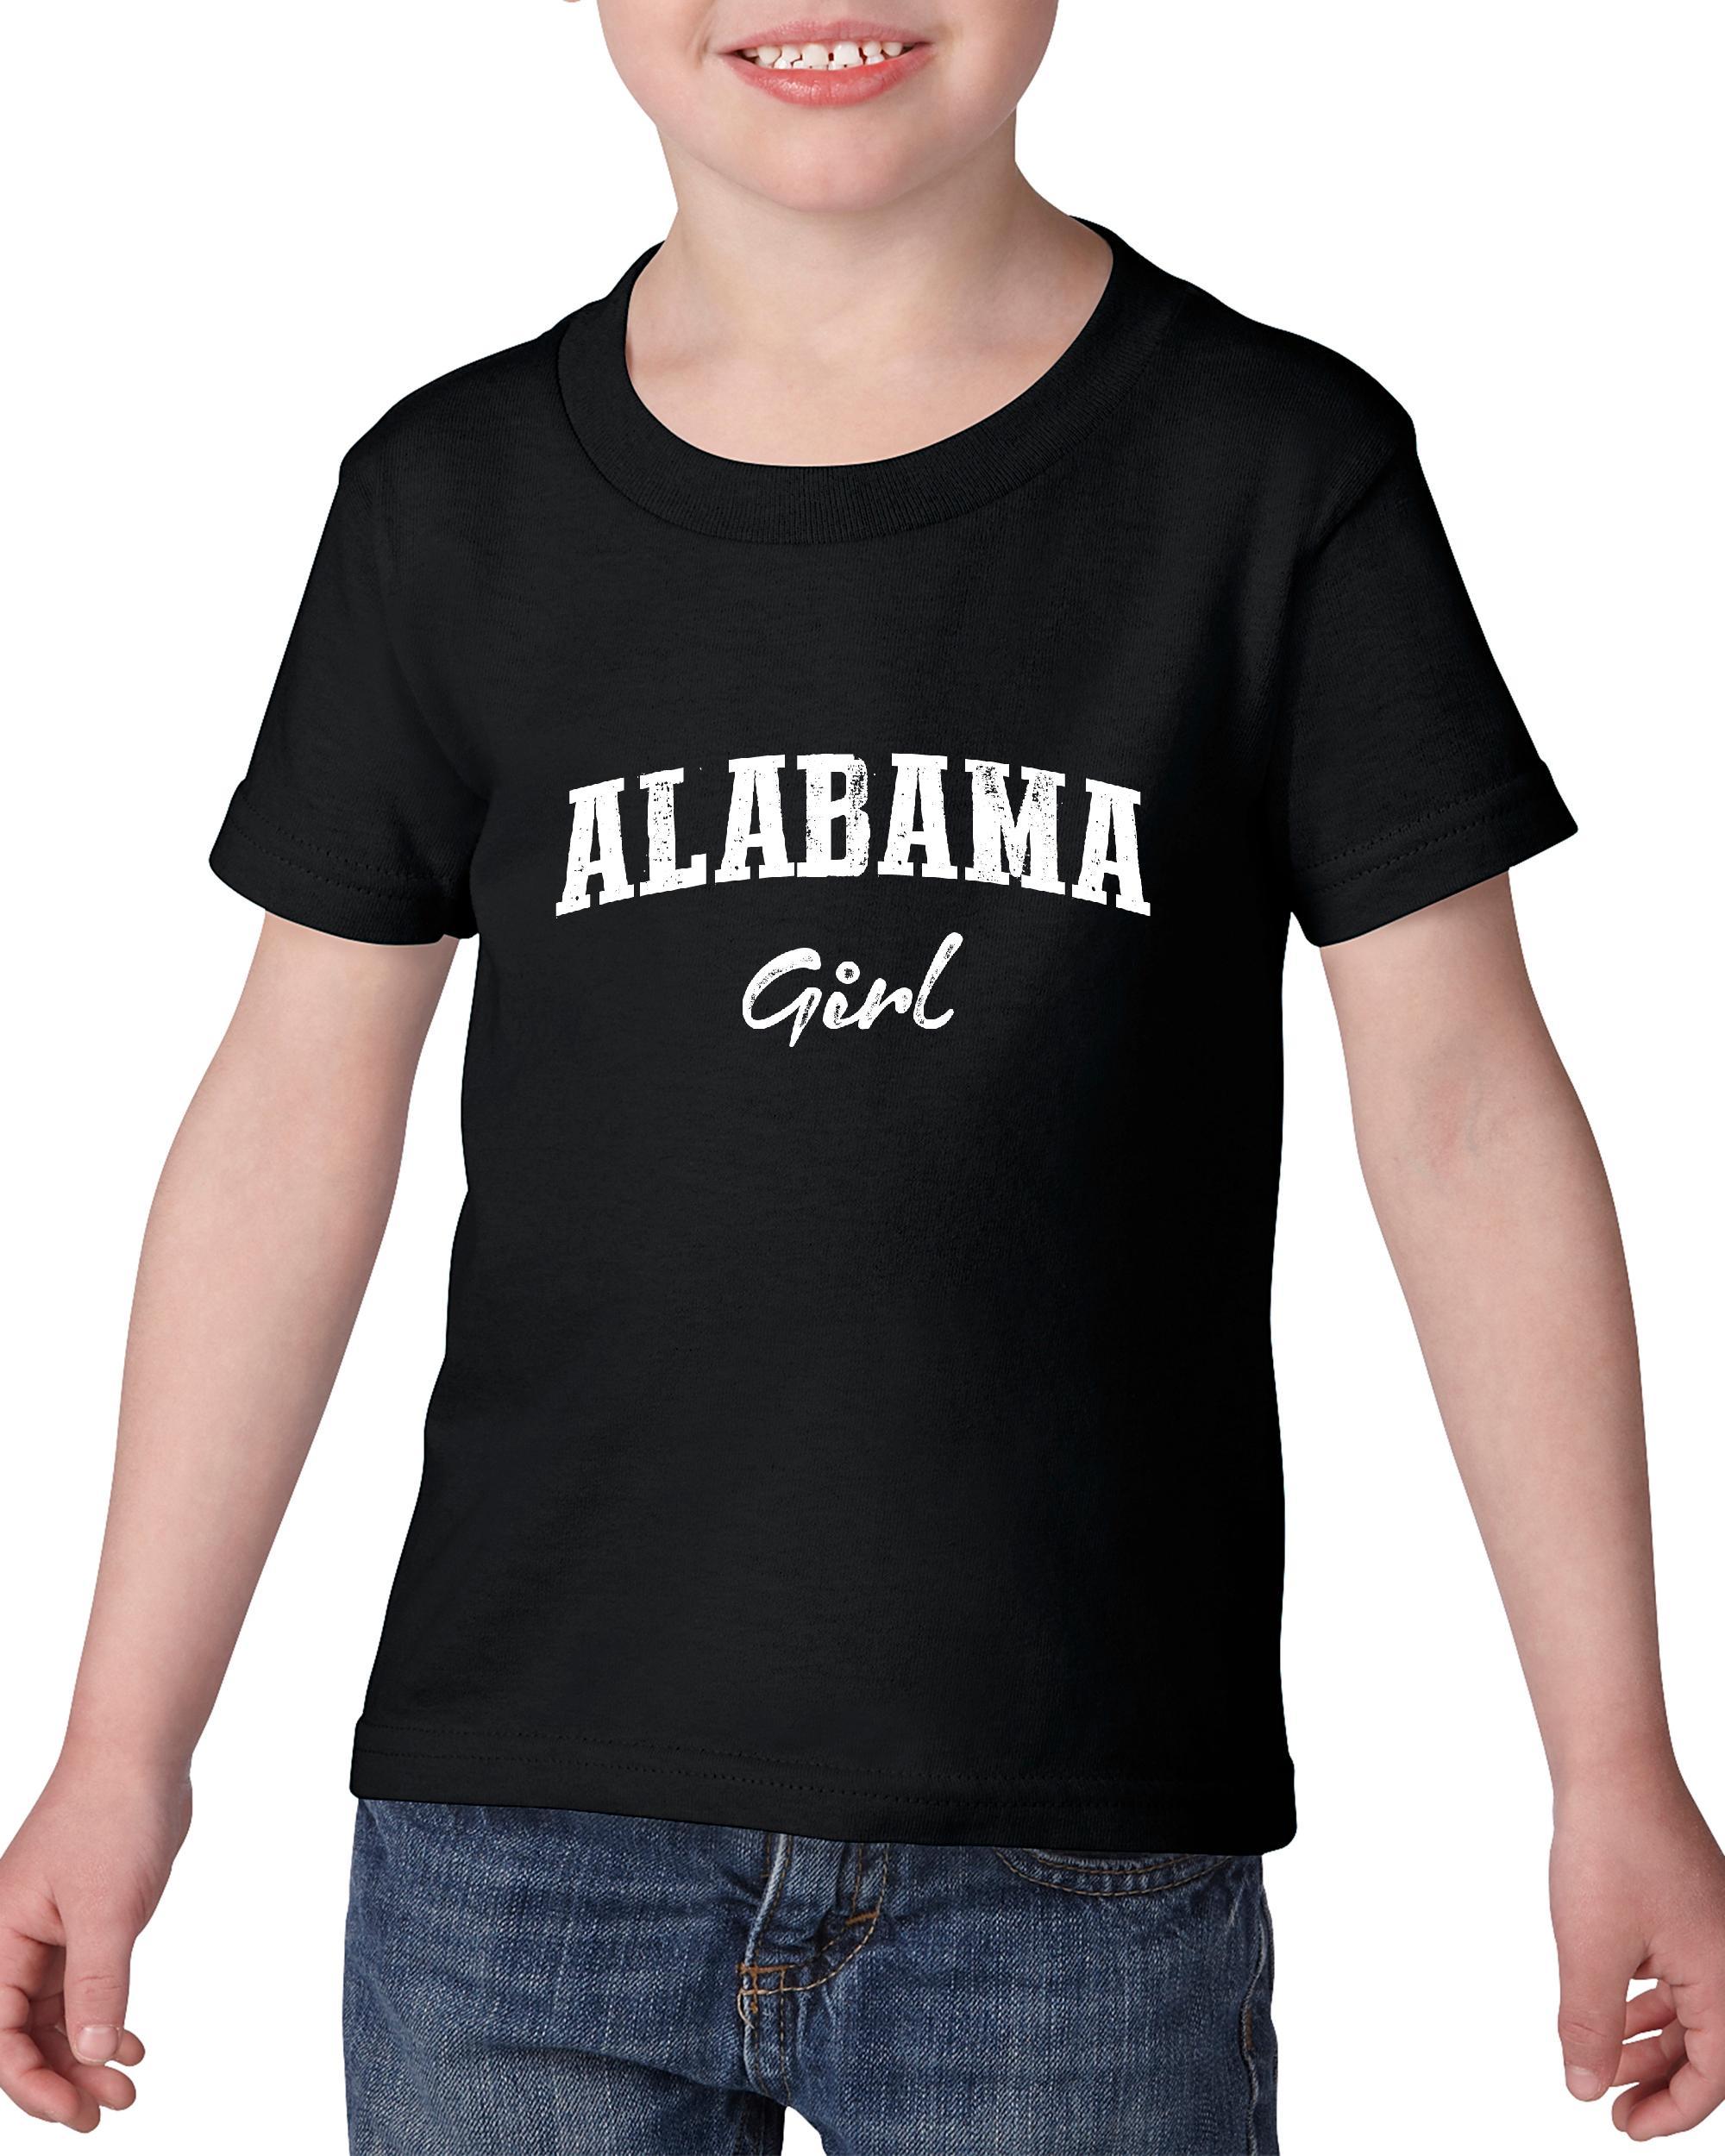 Artix AL Girl Yellowhammer Montgomery Flag Map Home of University of Alabama AU Heavy Cotton Toddler Kids T-Shirt Tee Clothing